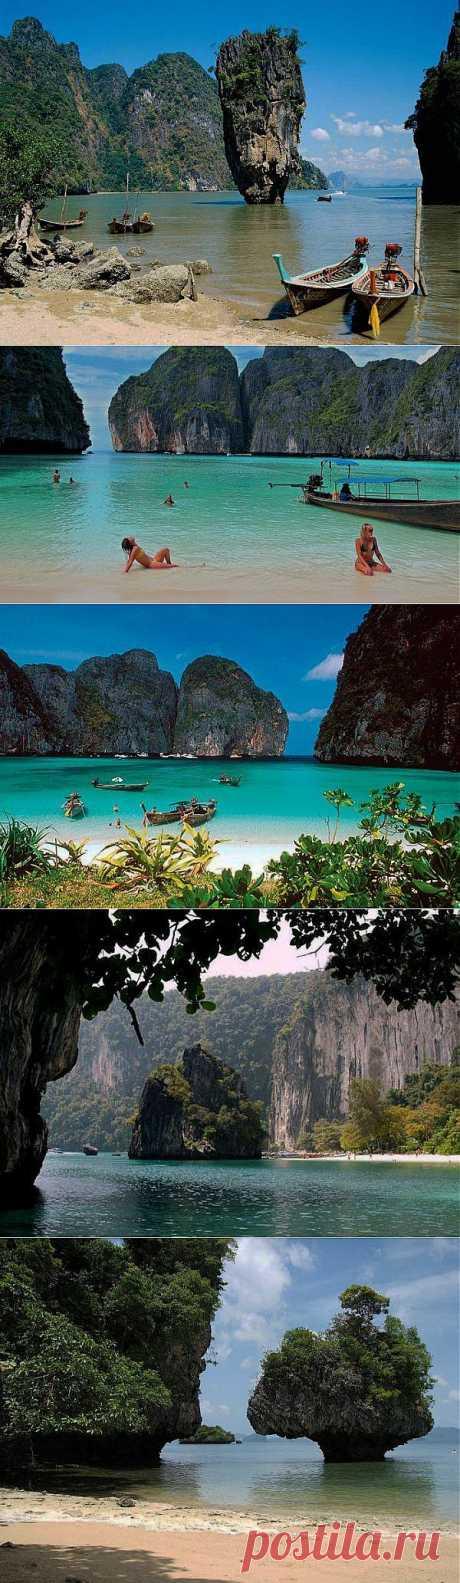 Волшебный Таиланд: Краби ( 13 фото)